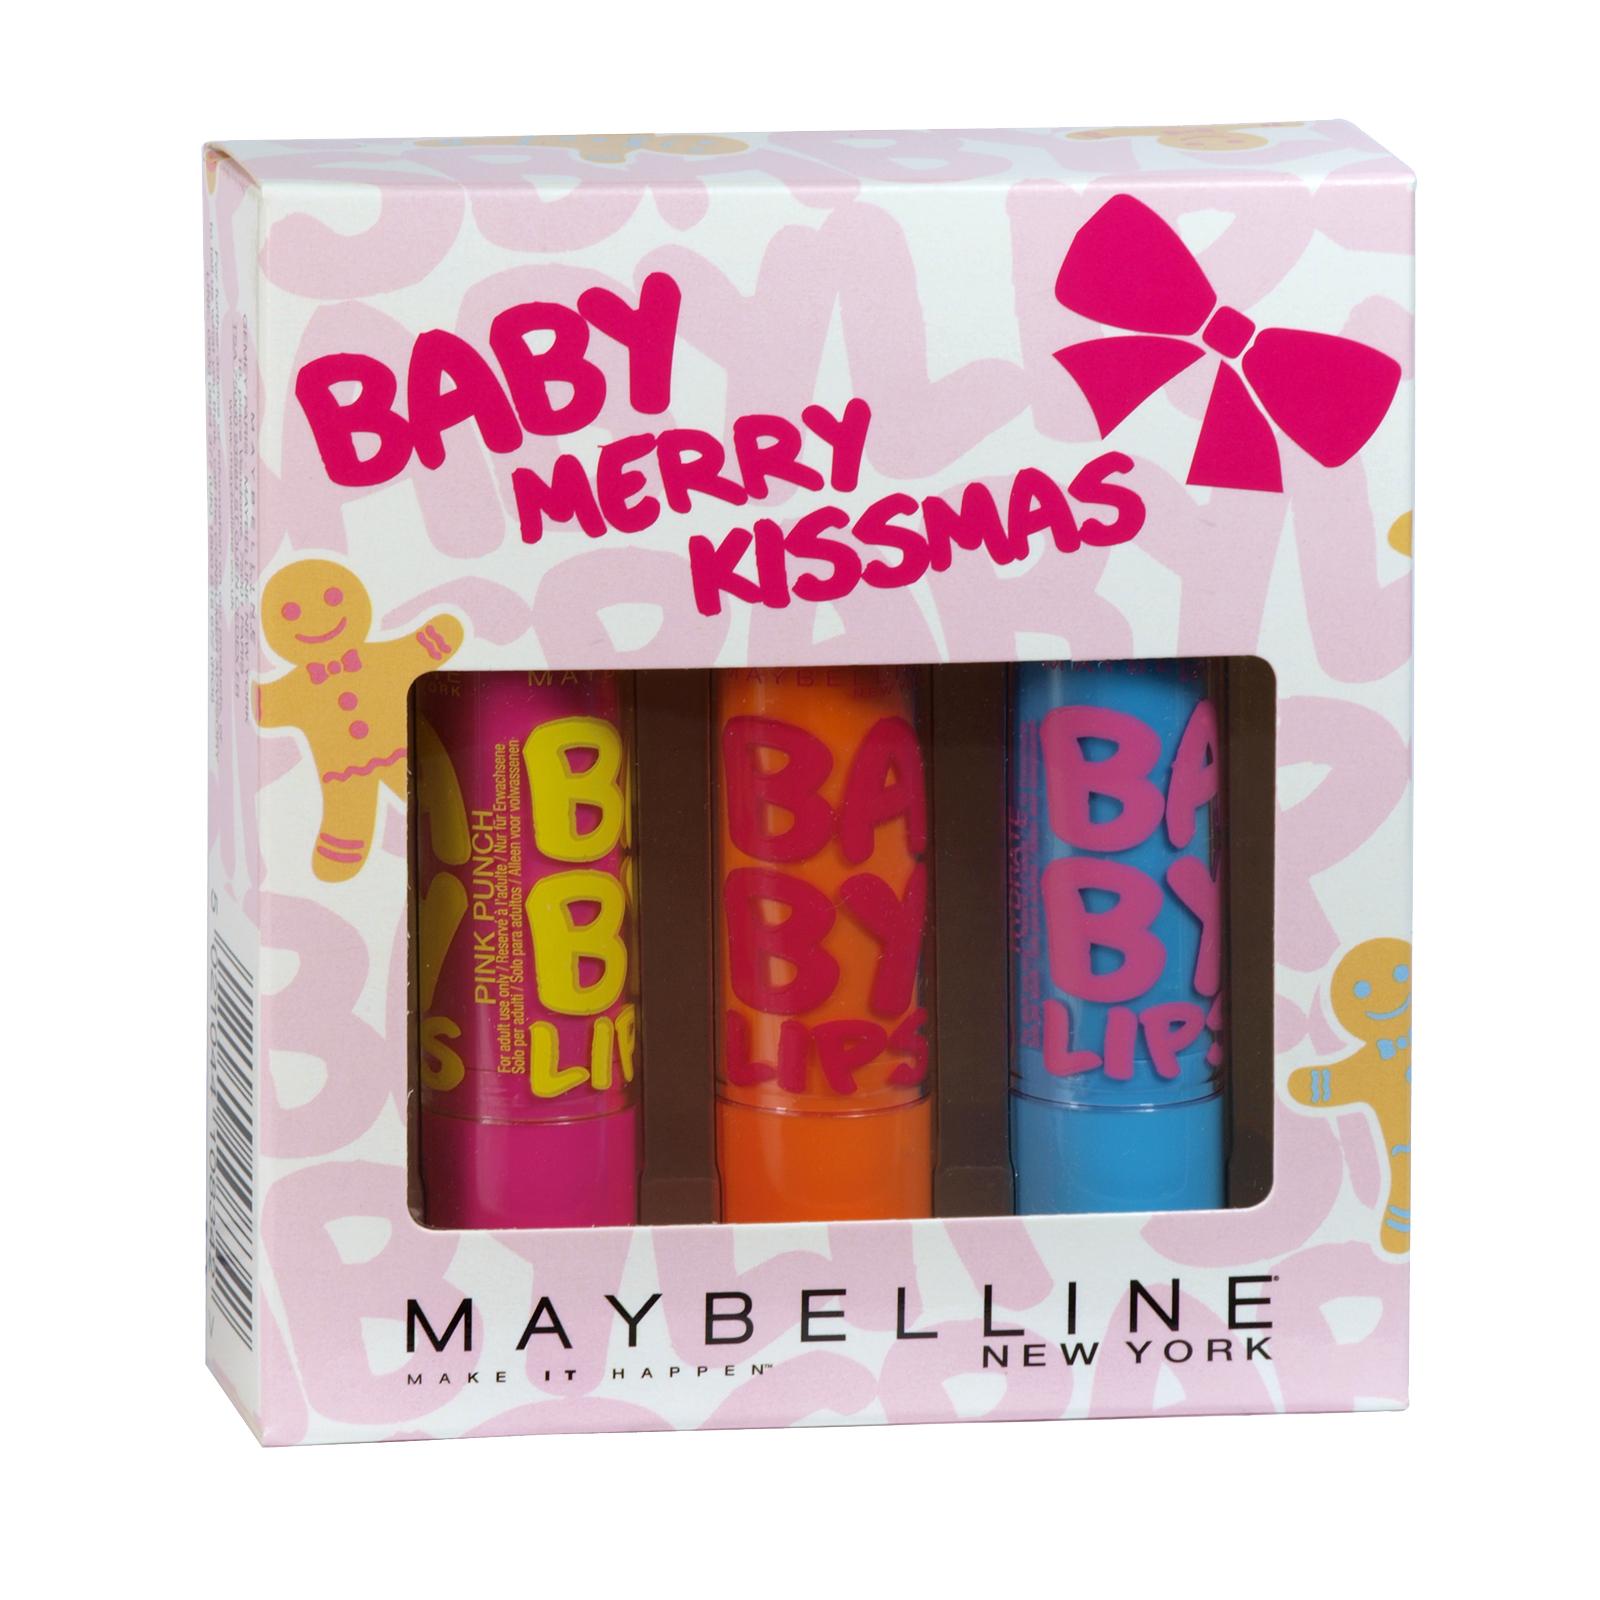 MAYBELLINE BABY MERRY KISSMAS